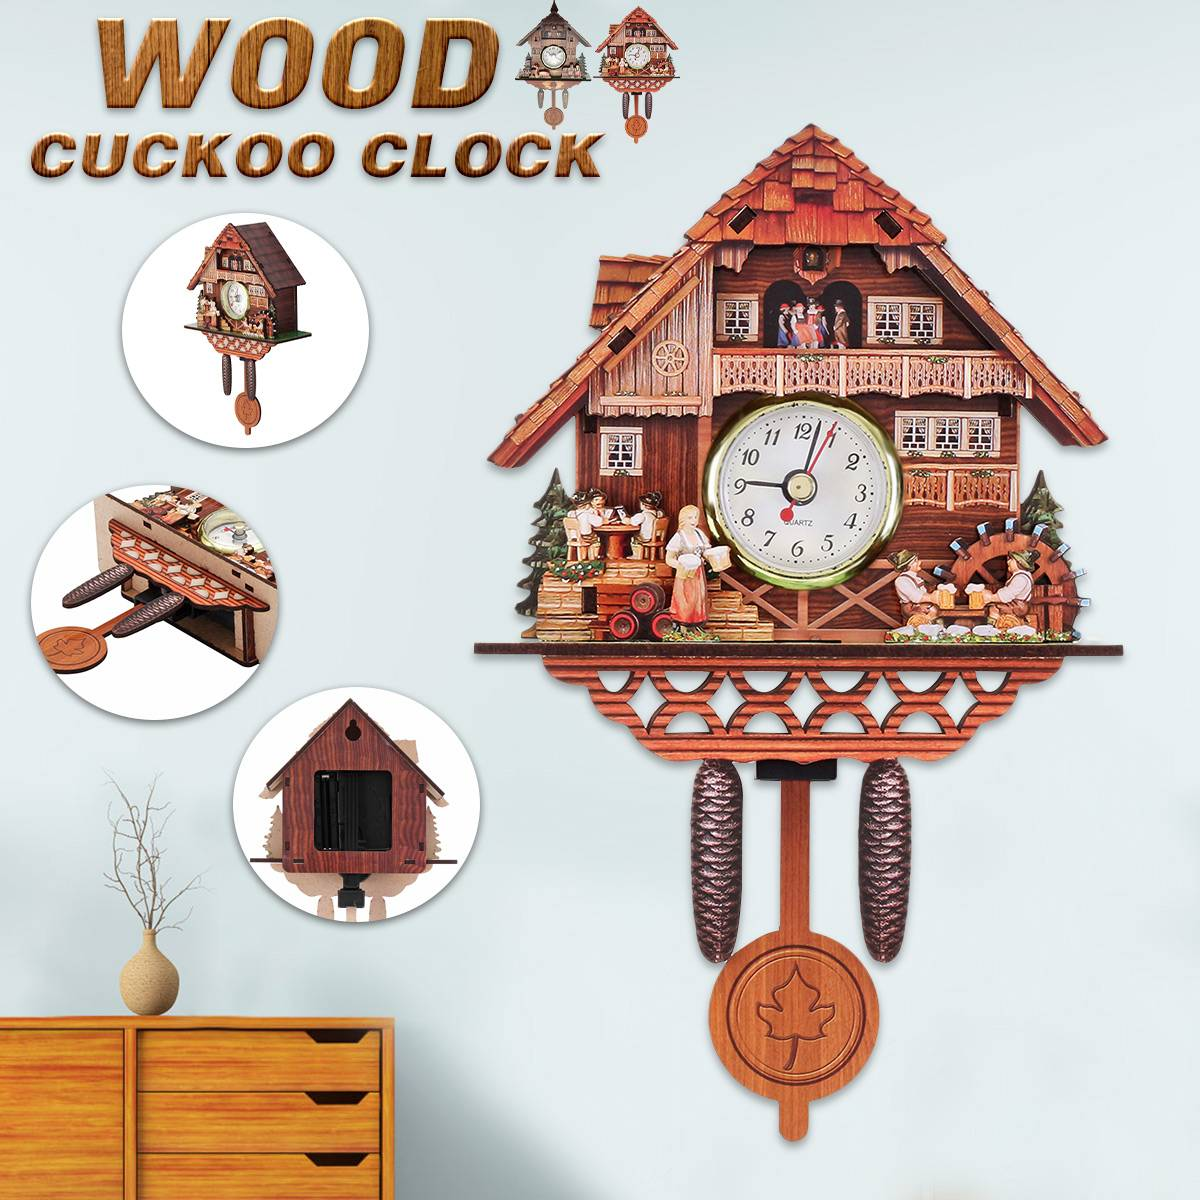 Cuckoo Clock Mount Wooden Wall Clock Alarm Clock Hanging Time Analog Auto Swinging Clock  Pendulum Home Decorations